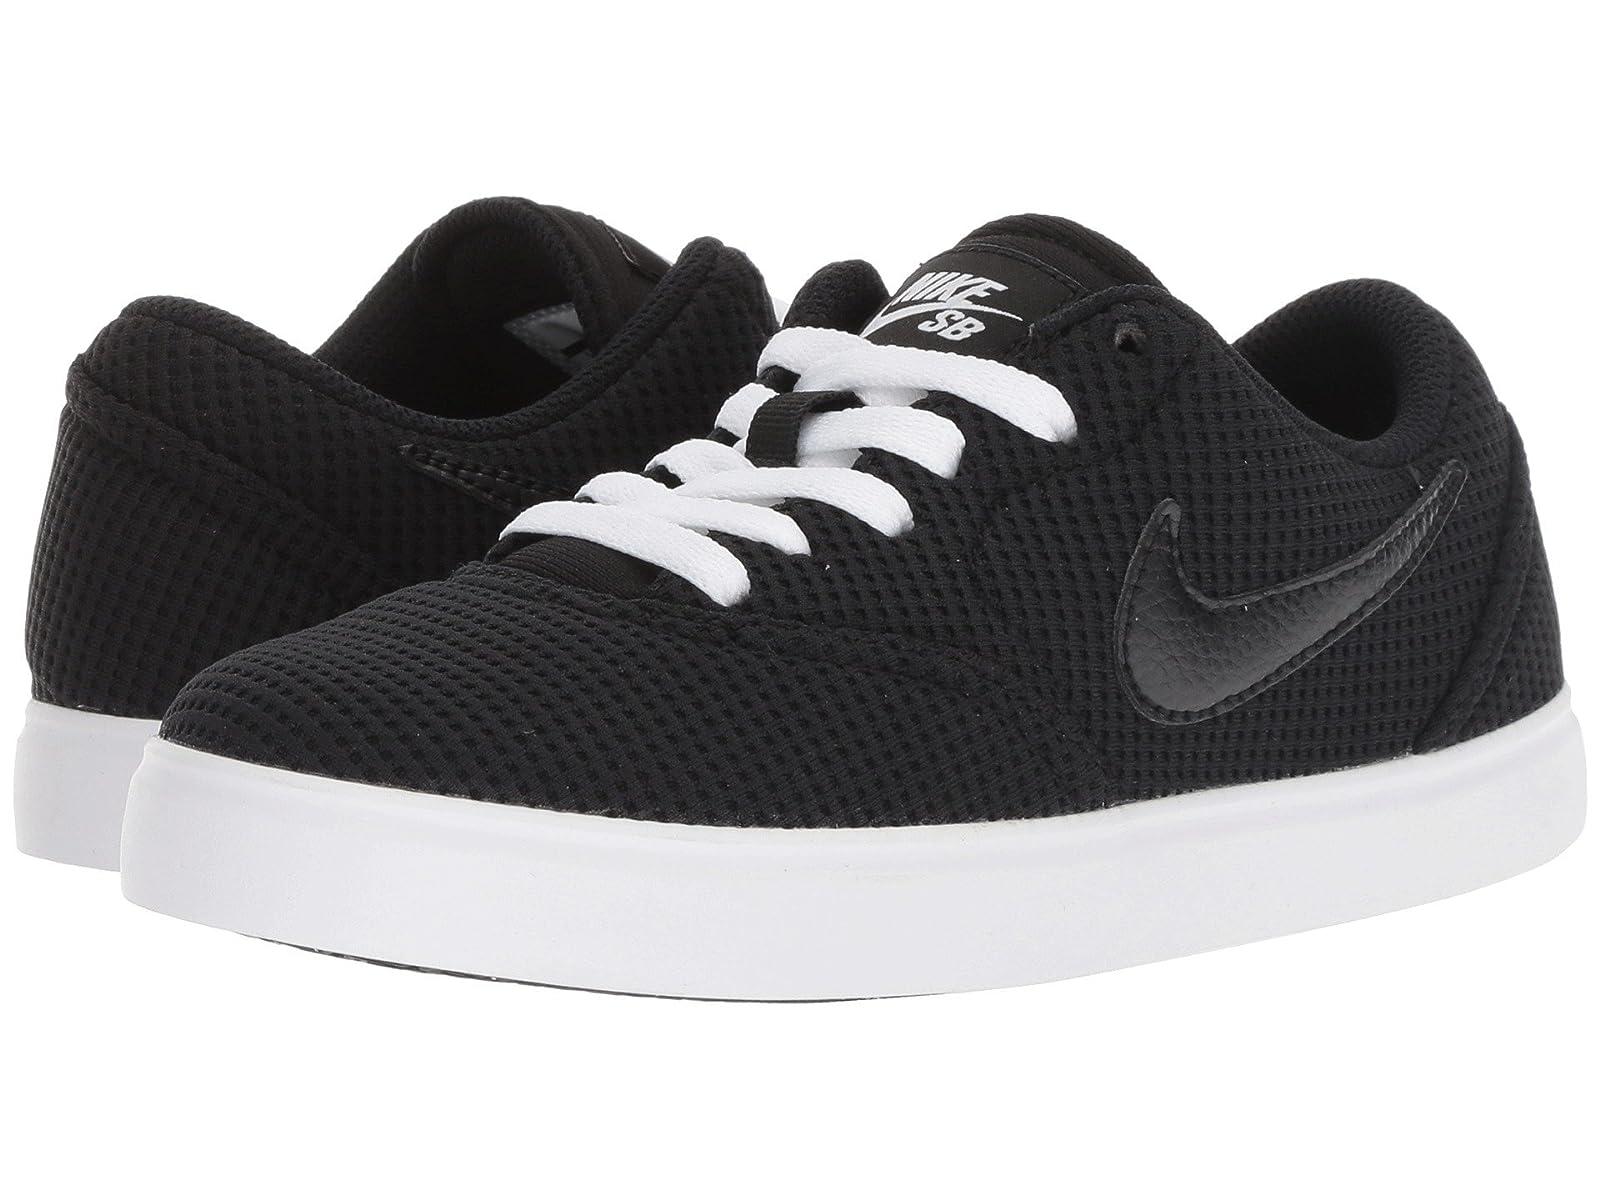 Nike SB Kids Check Canvas (Big Kid)Atmospheric grades have affordable shoes